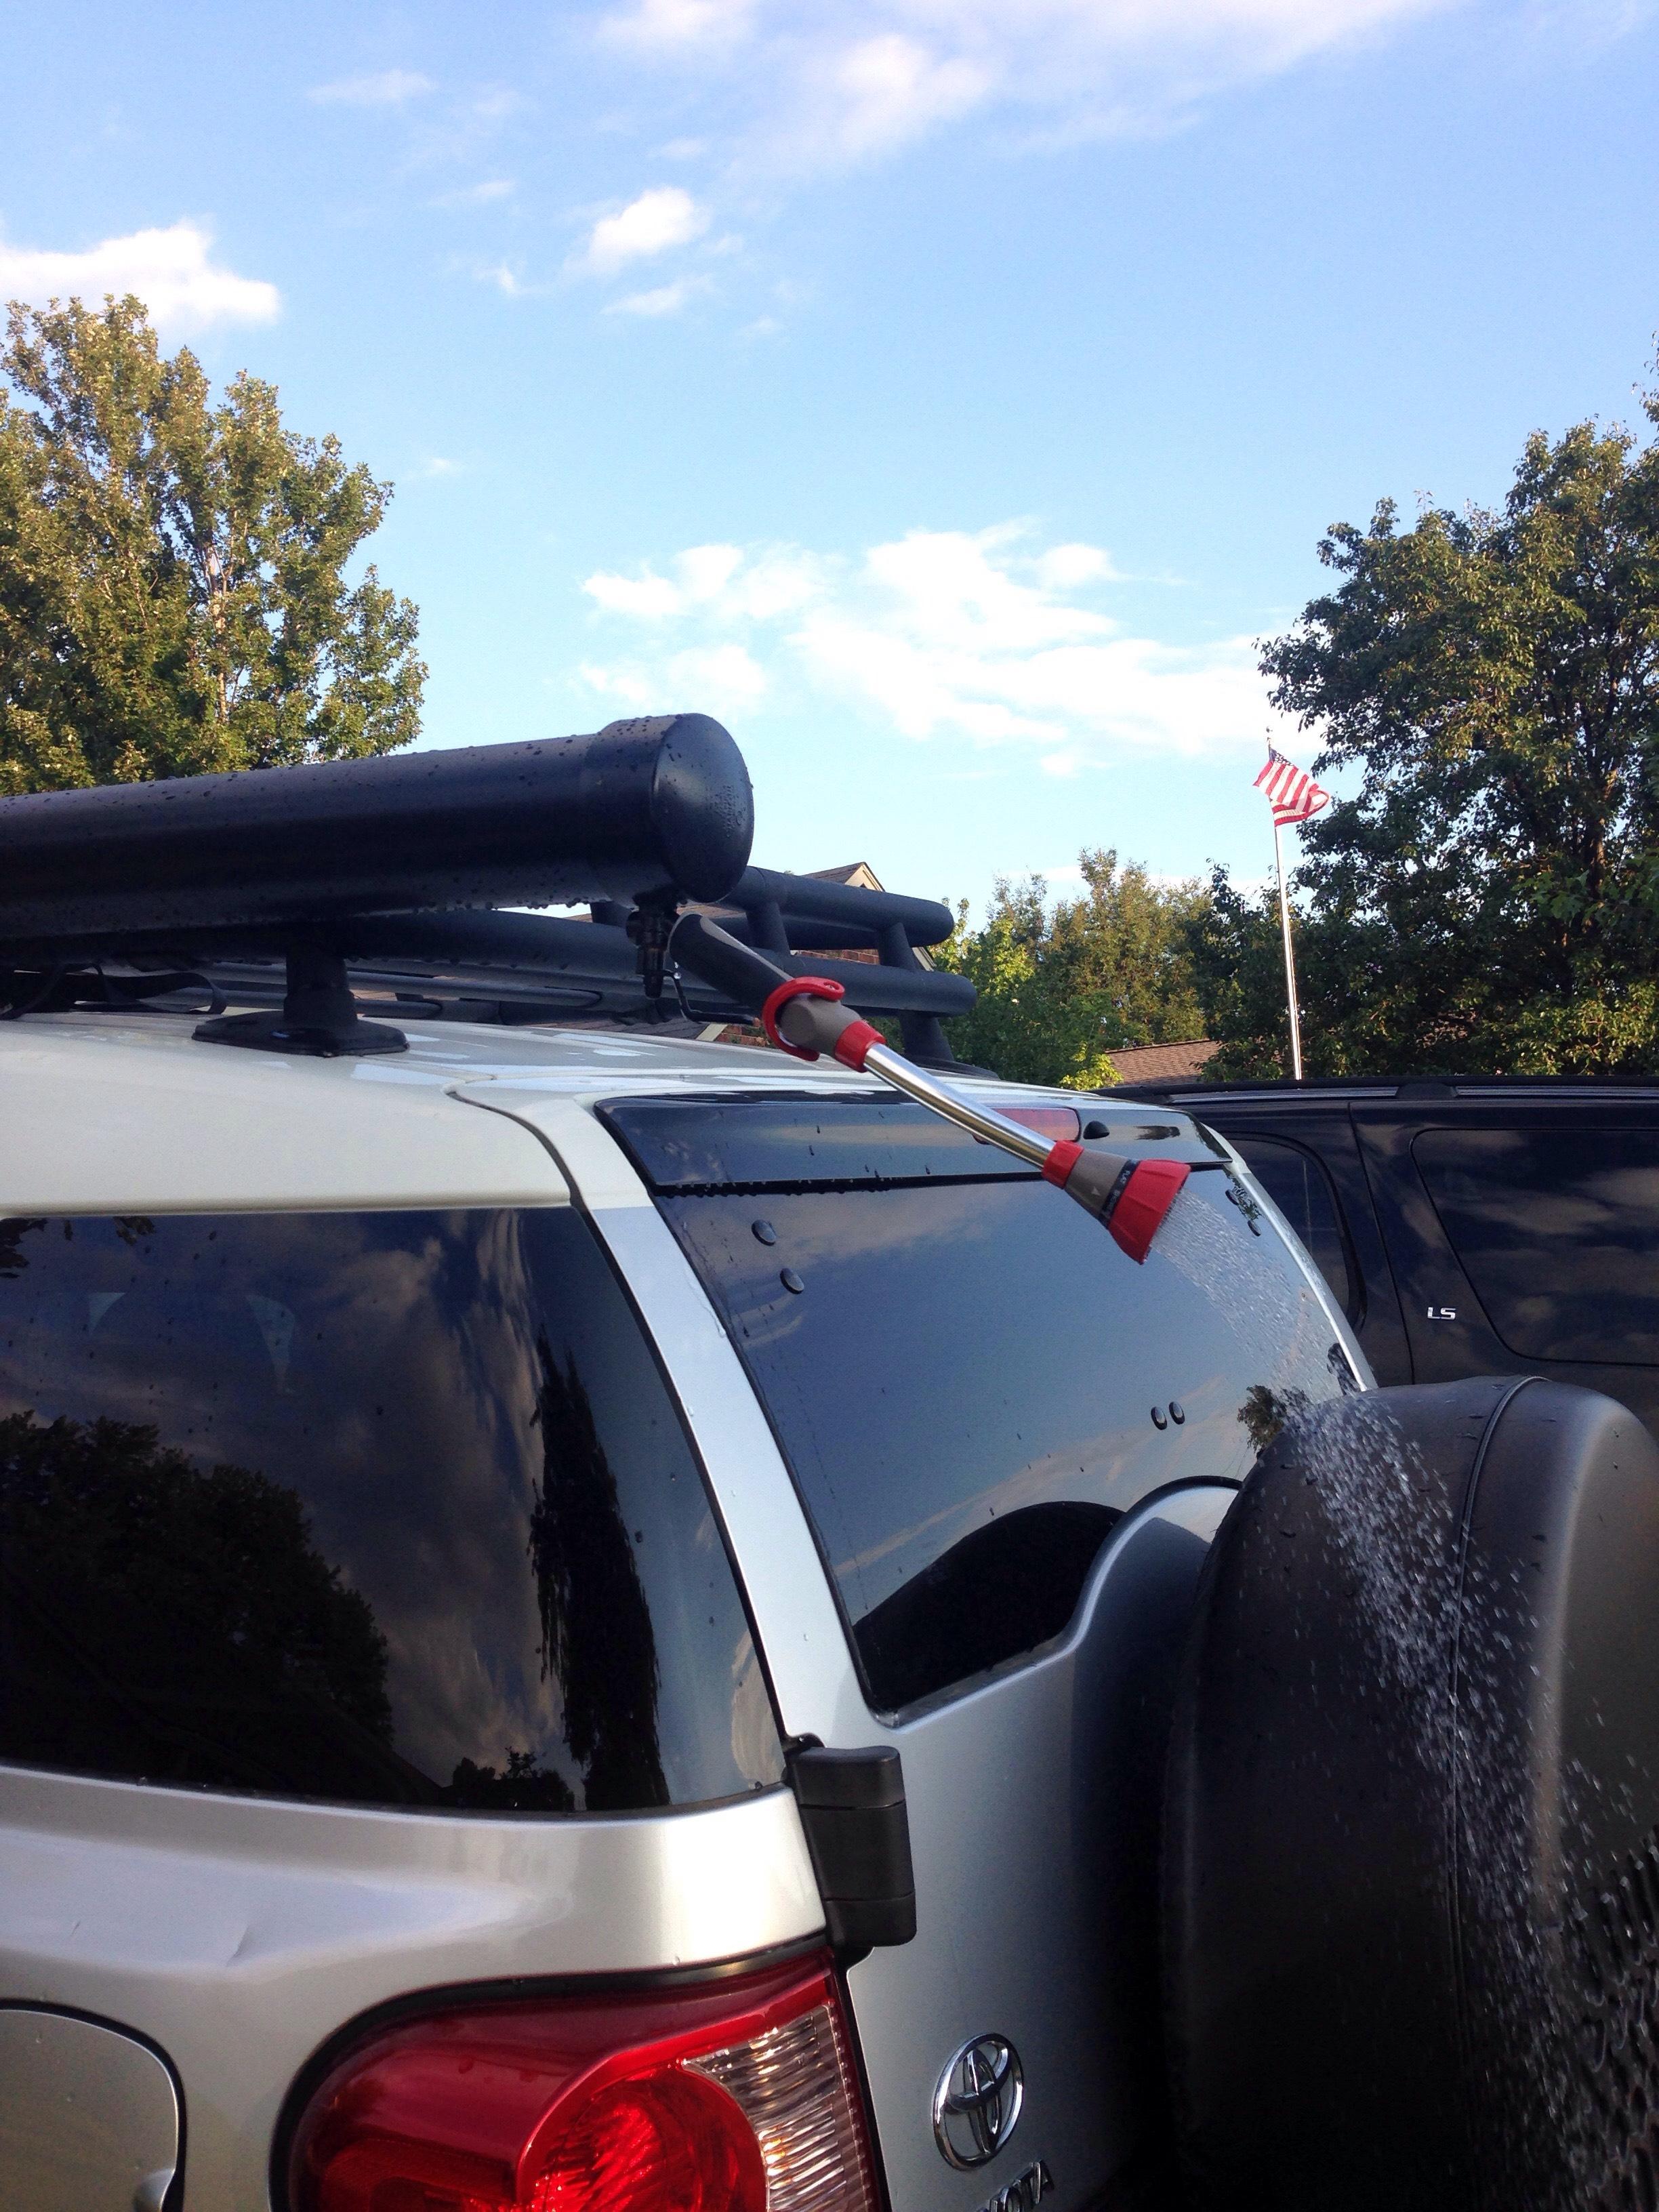 Picture of Roof Rack Shower for Outdoor Activities